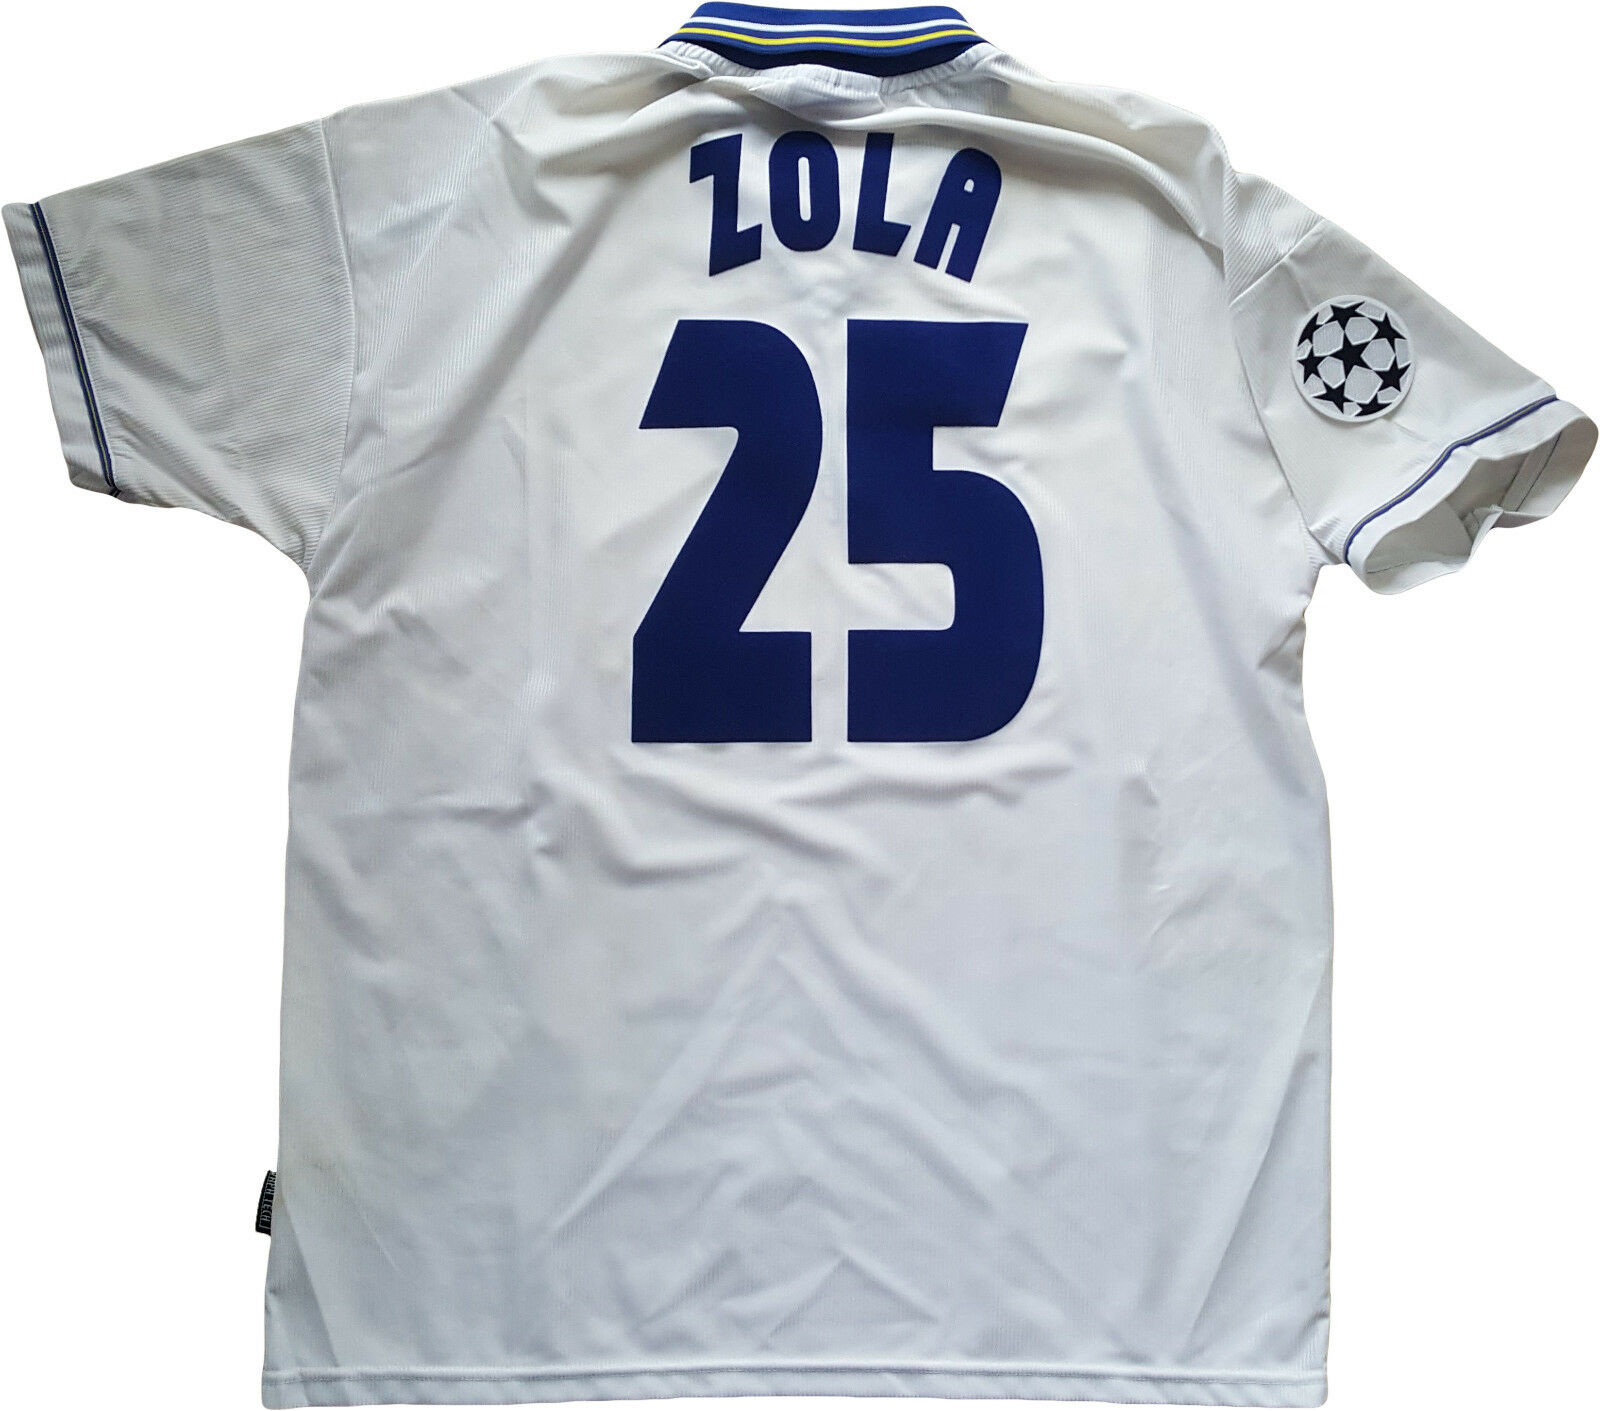 Maglia Zola Chelsea Umbro 1999 2000 away Jersey Autoglass Player issue Uefa UCL